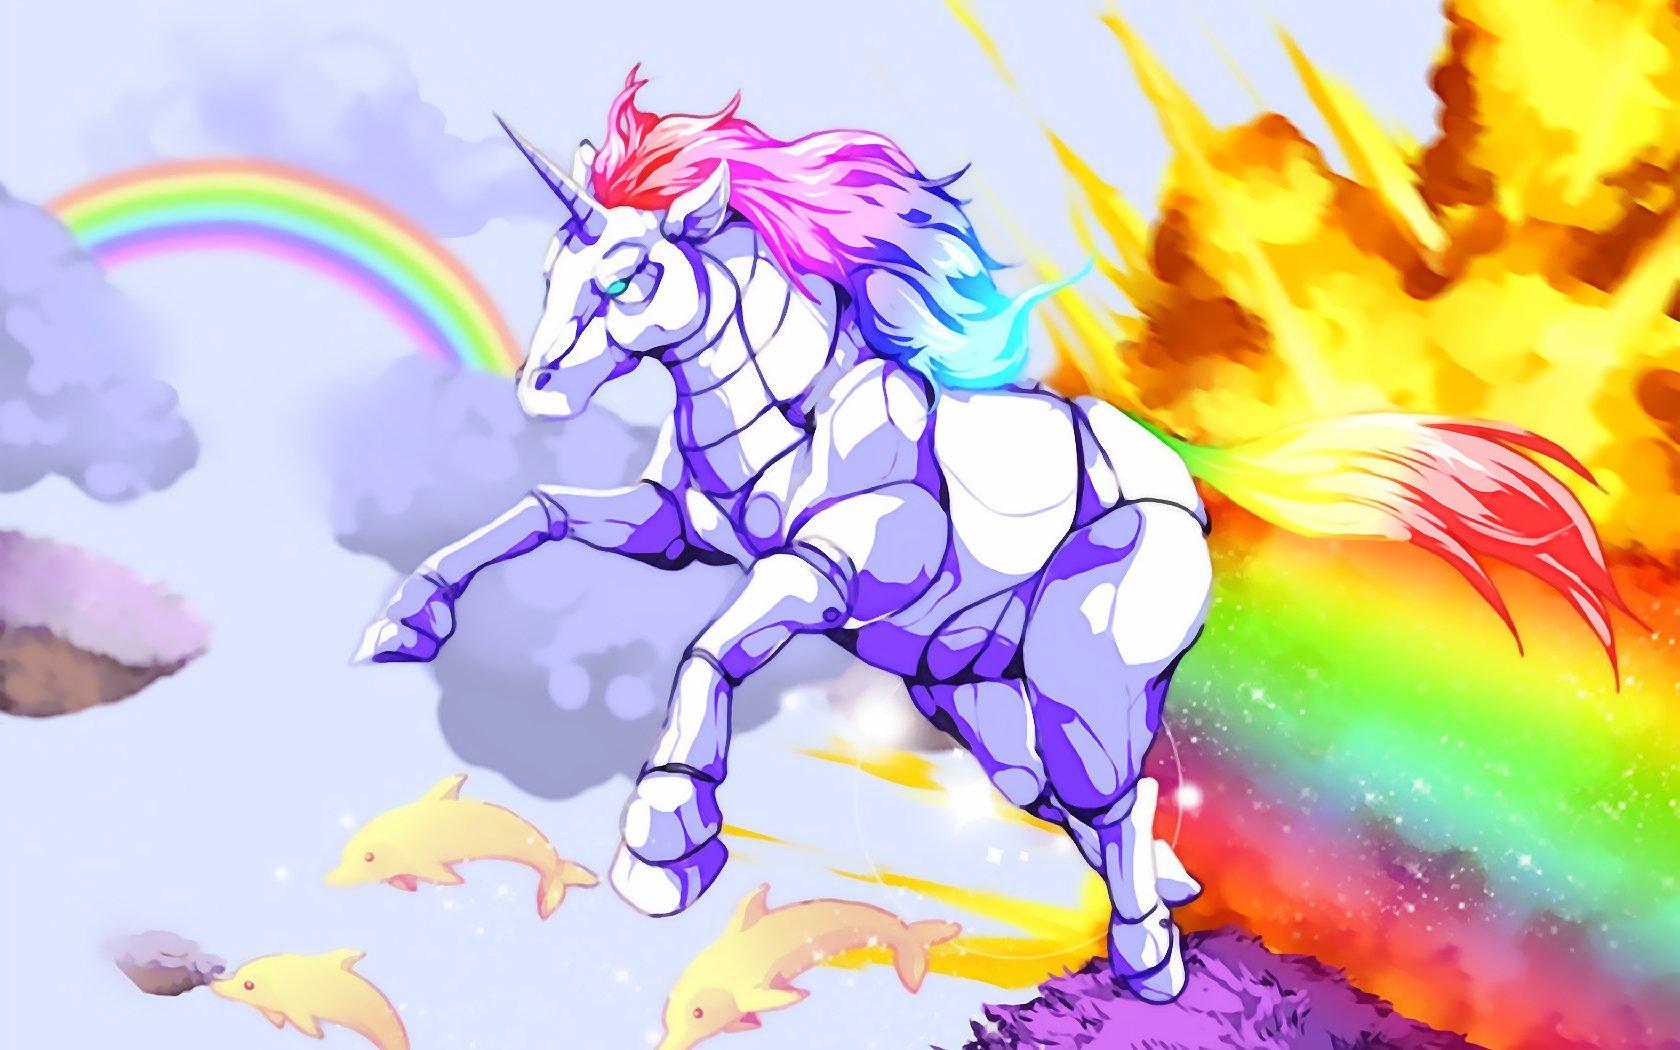 Hd wallpaper unicorn - Hd Wallpaper Background Id 216948